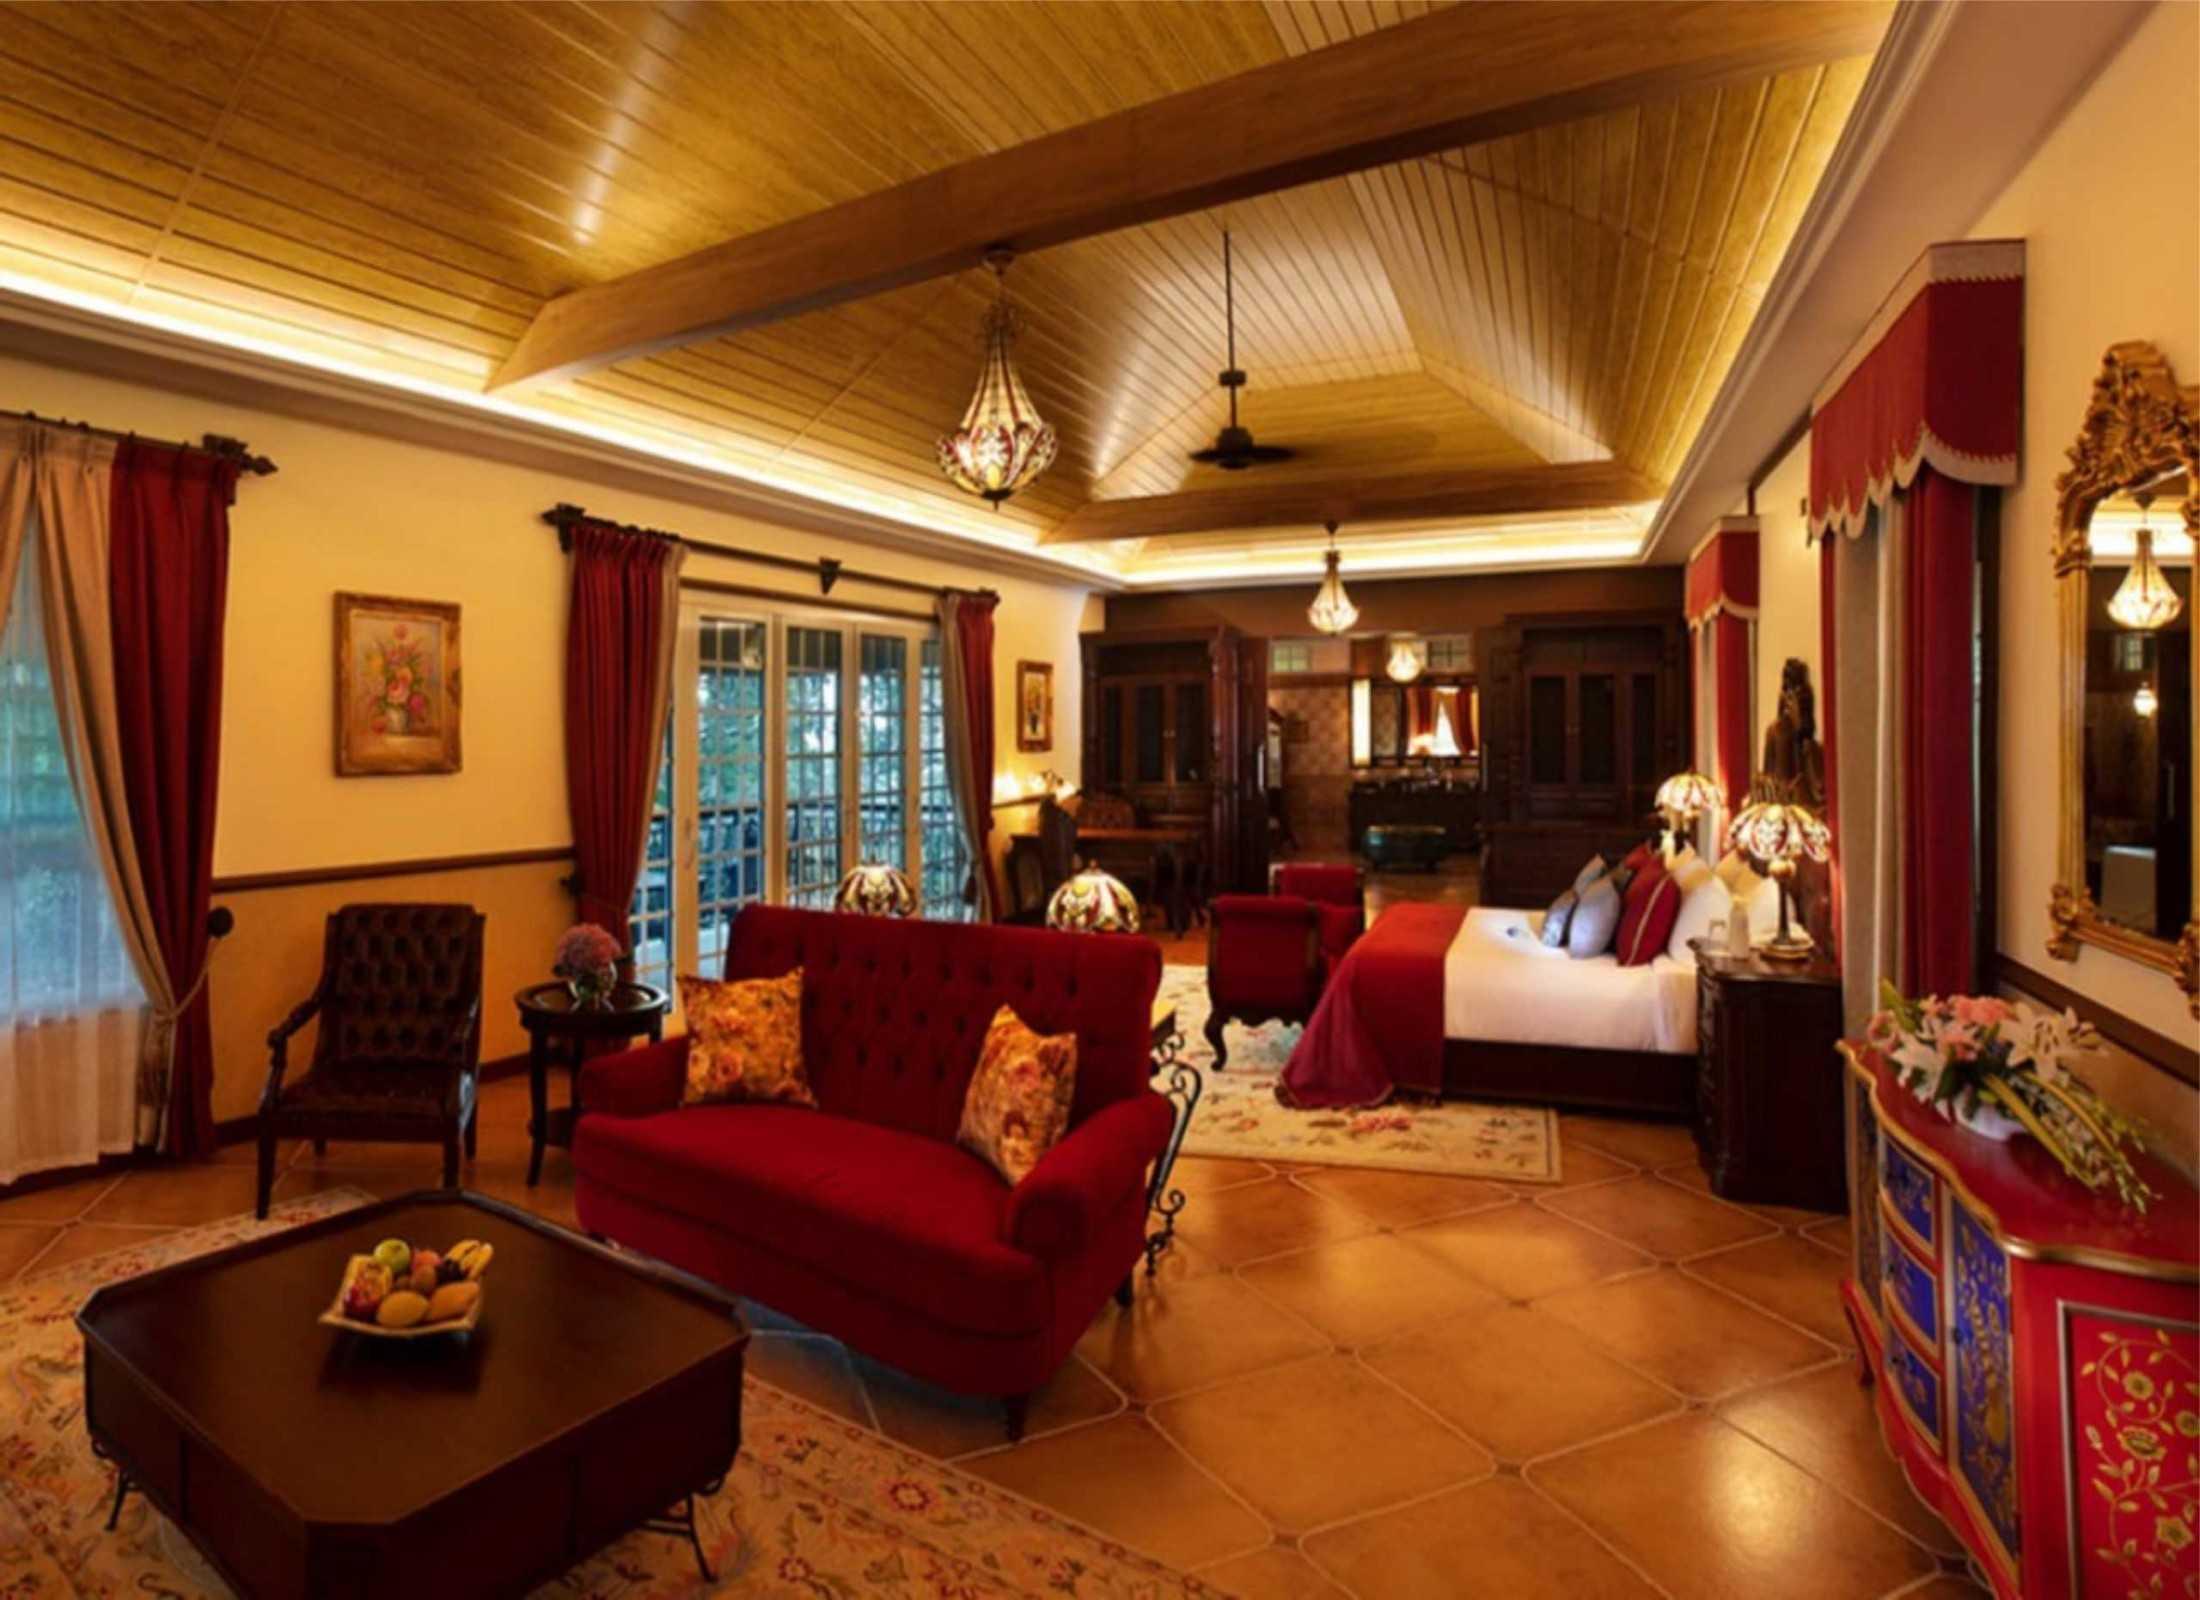 Rekai Design Interior Coorg Wilderness Resort, Coorg-India Virajpet, Main, Mysore - Madikeri Rd, Madikeri, Karnataka 571201, India Virajpet, Main, Mysore - Madikeri Rd, Madikeri, Karnataka 571201, India Rekai-Design-Interior-Coorg-Wilderness-Resort-Coorg-India  113299